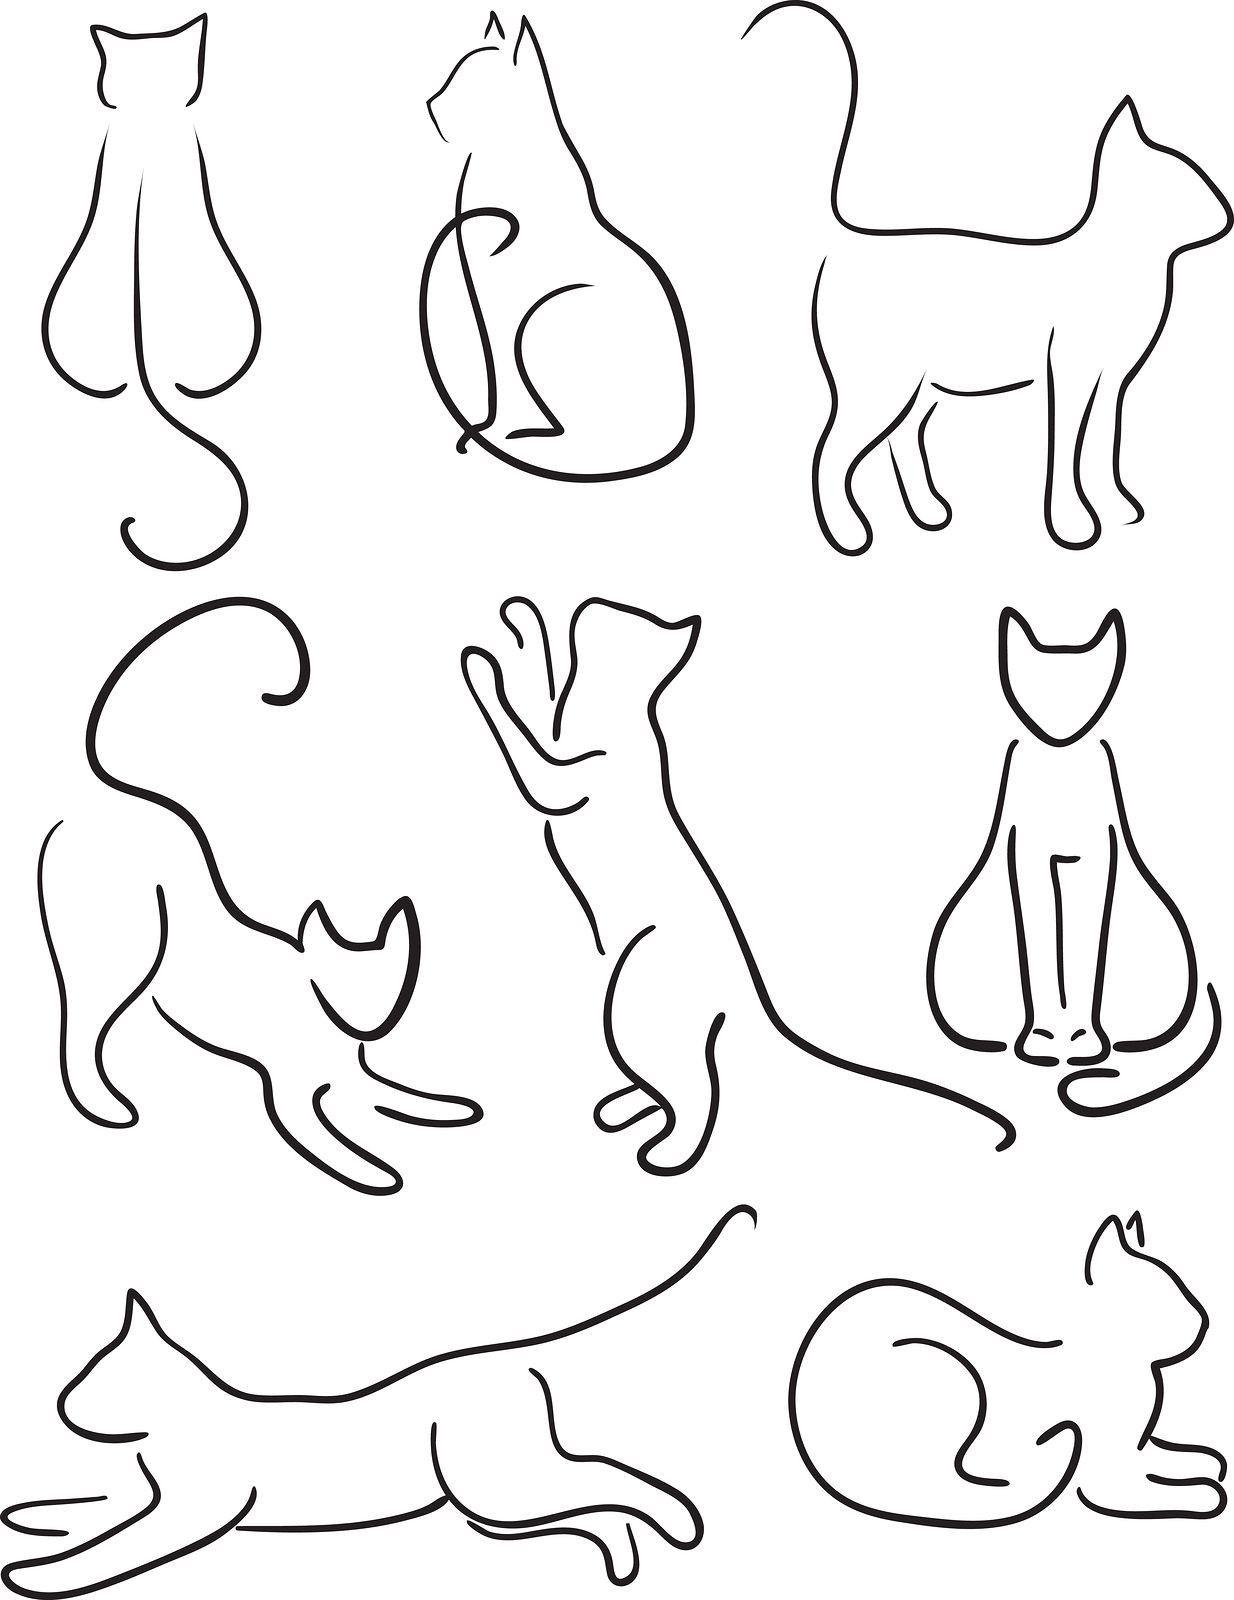 Neu Katzen Zum Malen Farbung Malvorlagen Malvorlagenfurkinder Katzen Katzen Silhouette Katze Zeichnen